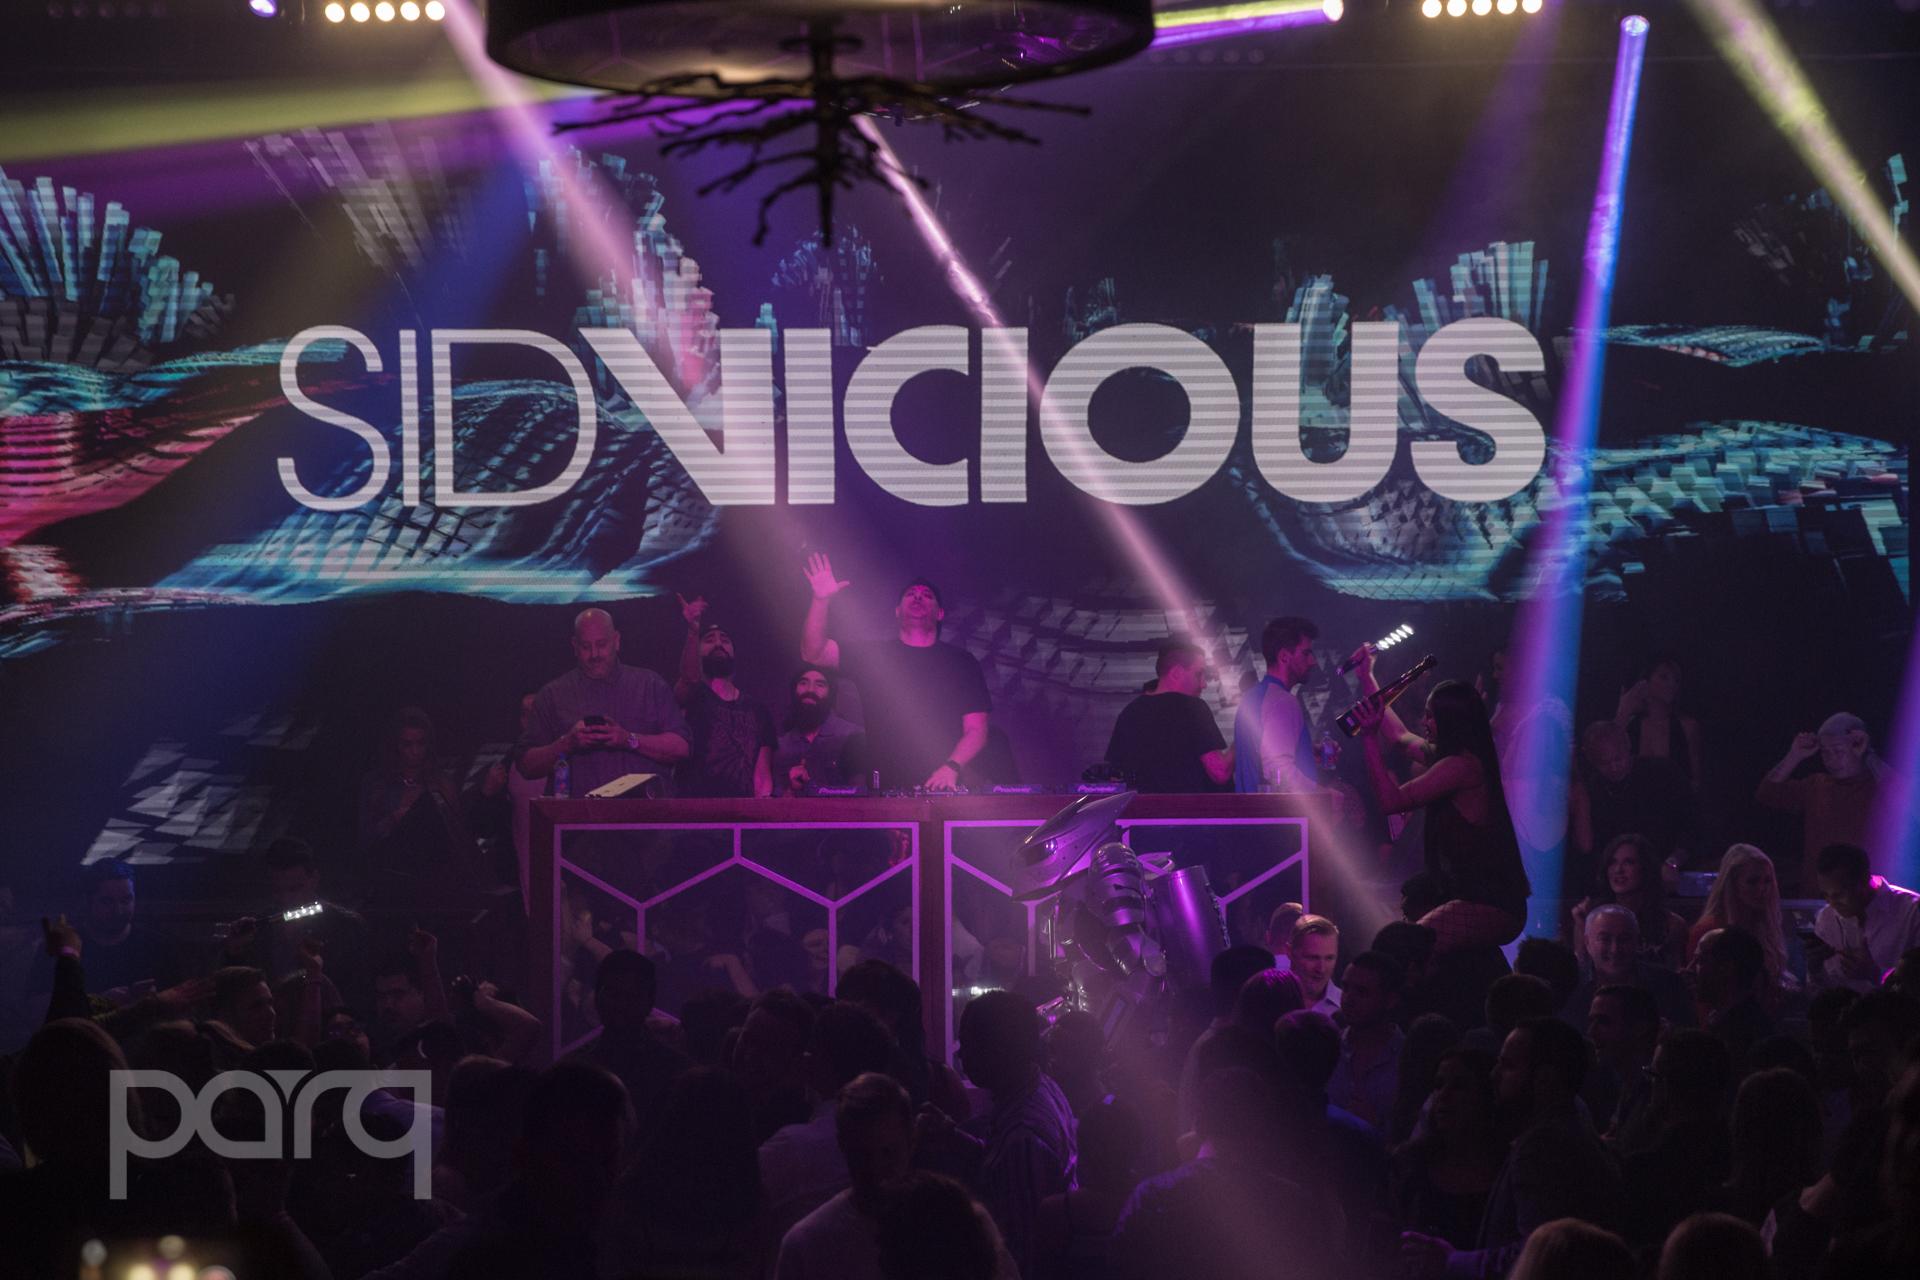 San-Diego-Nightclub-Sid Vicious-33.jpg